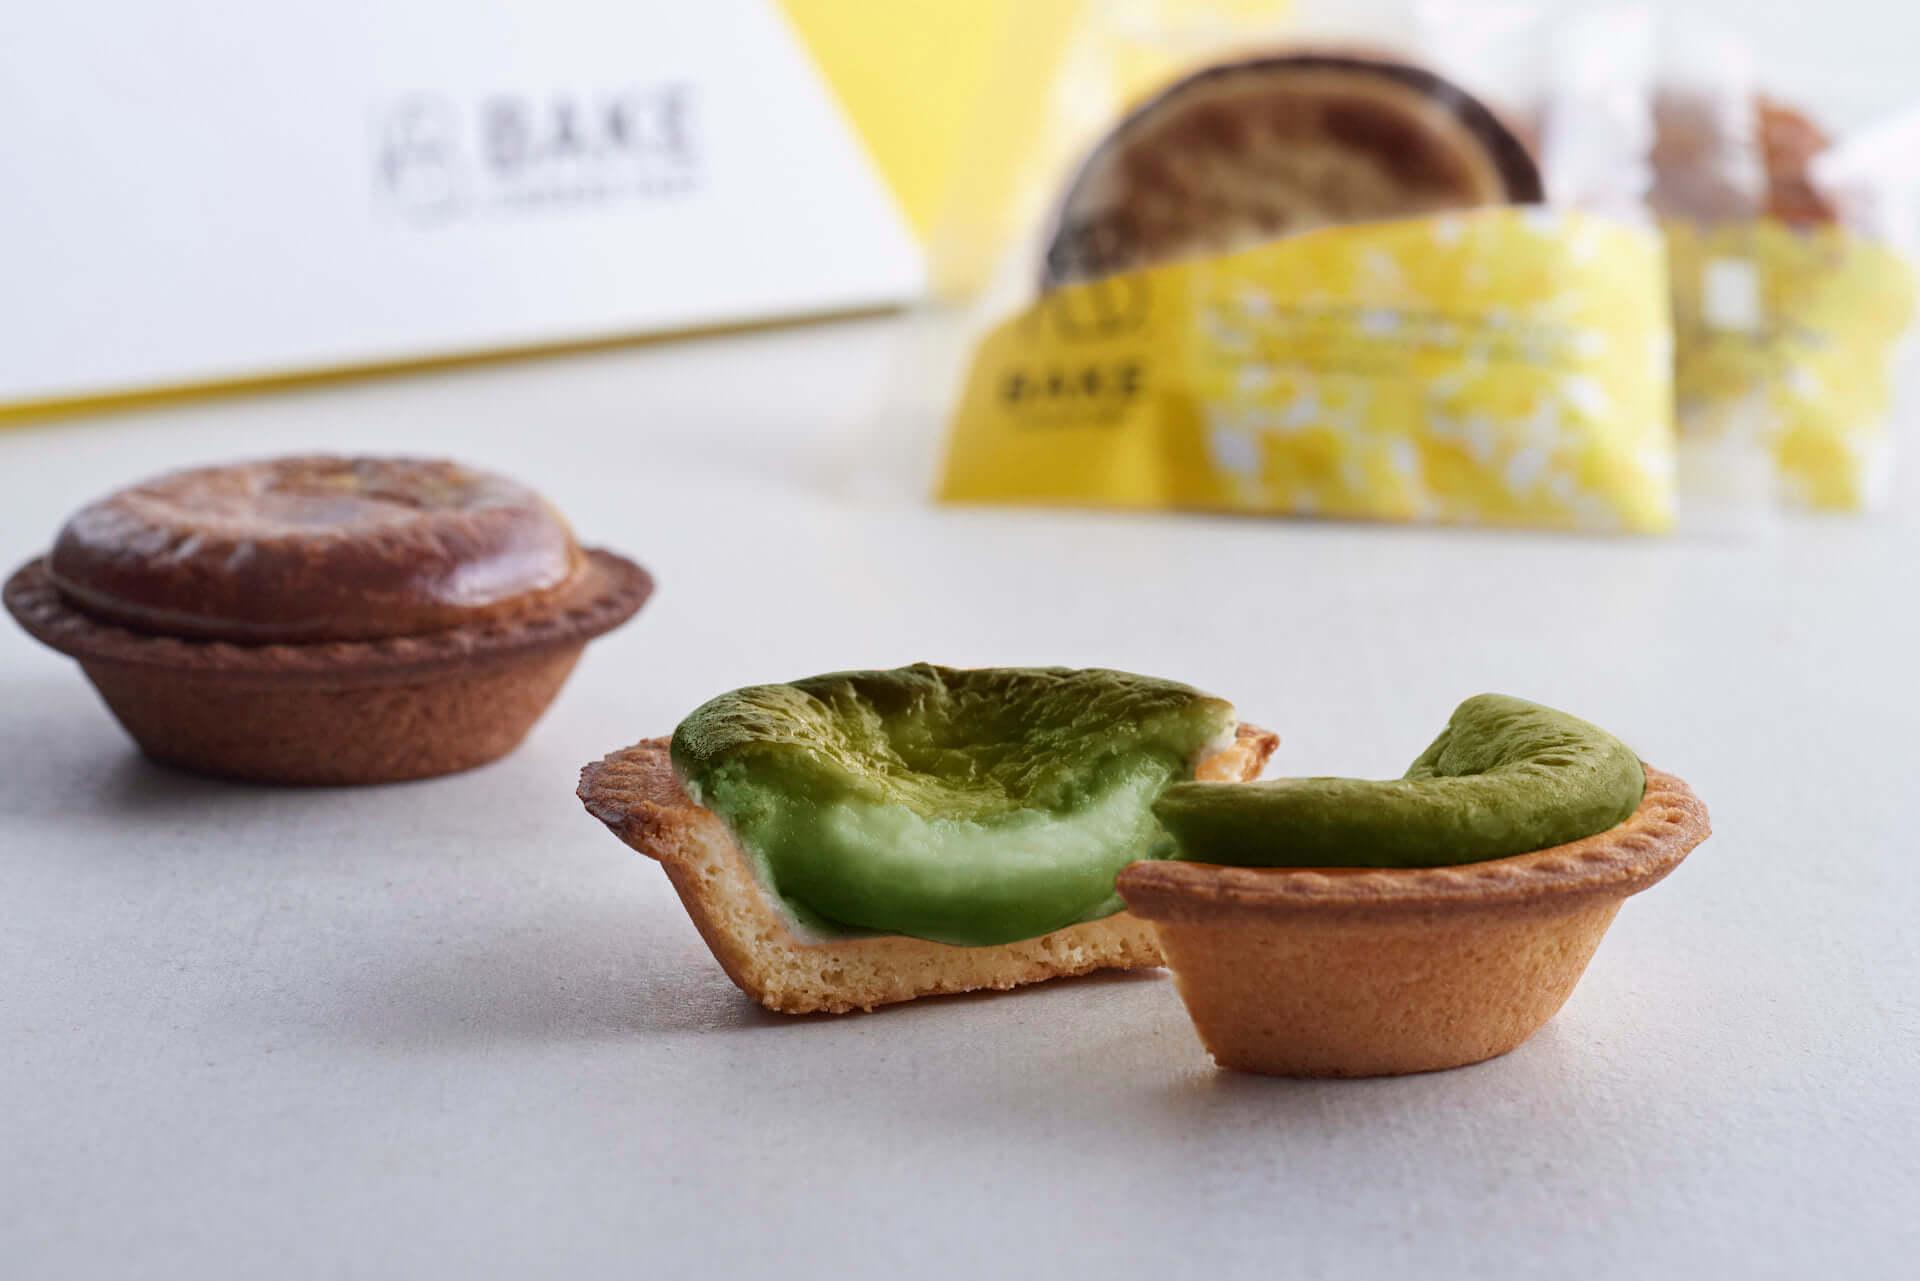 BAKE初の公式オンラインショップ「BAKE THE ONLINE」がオープン!チーズタルト10P BOXが50%OFFの特別価格に gourmet_bake_online_03-1920x1281